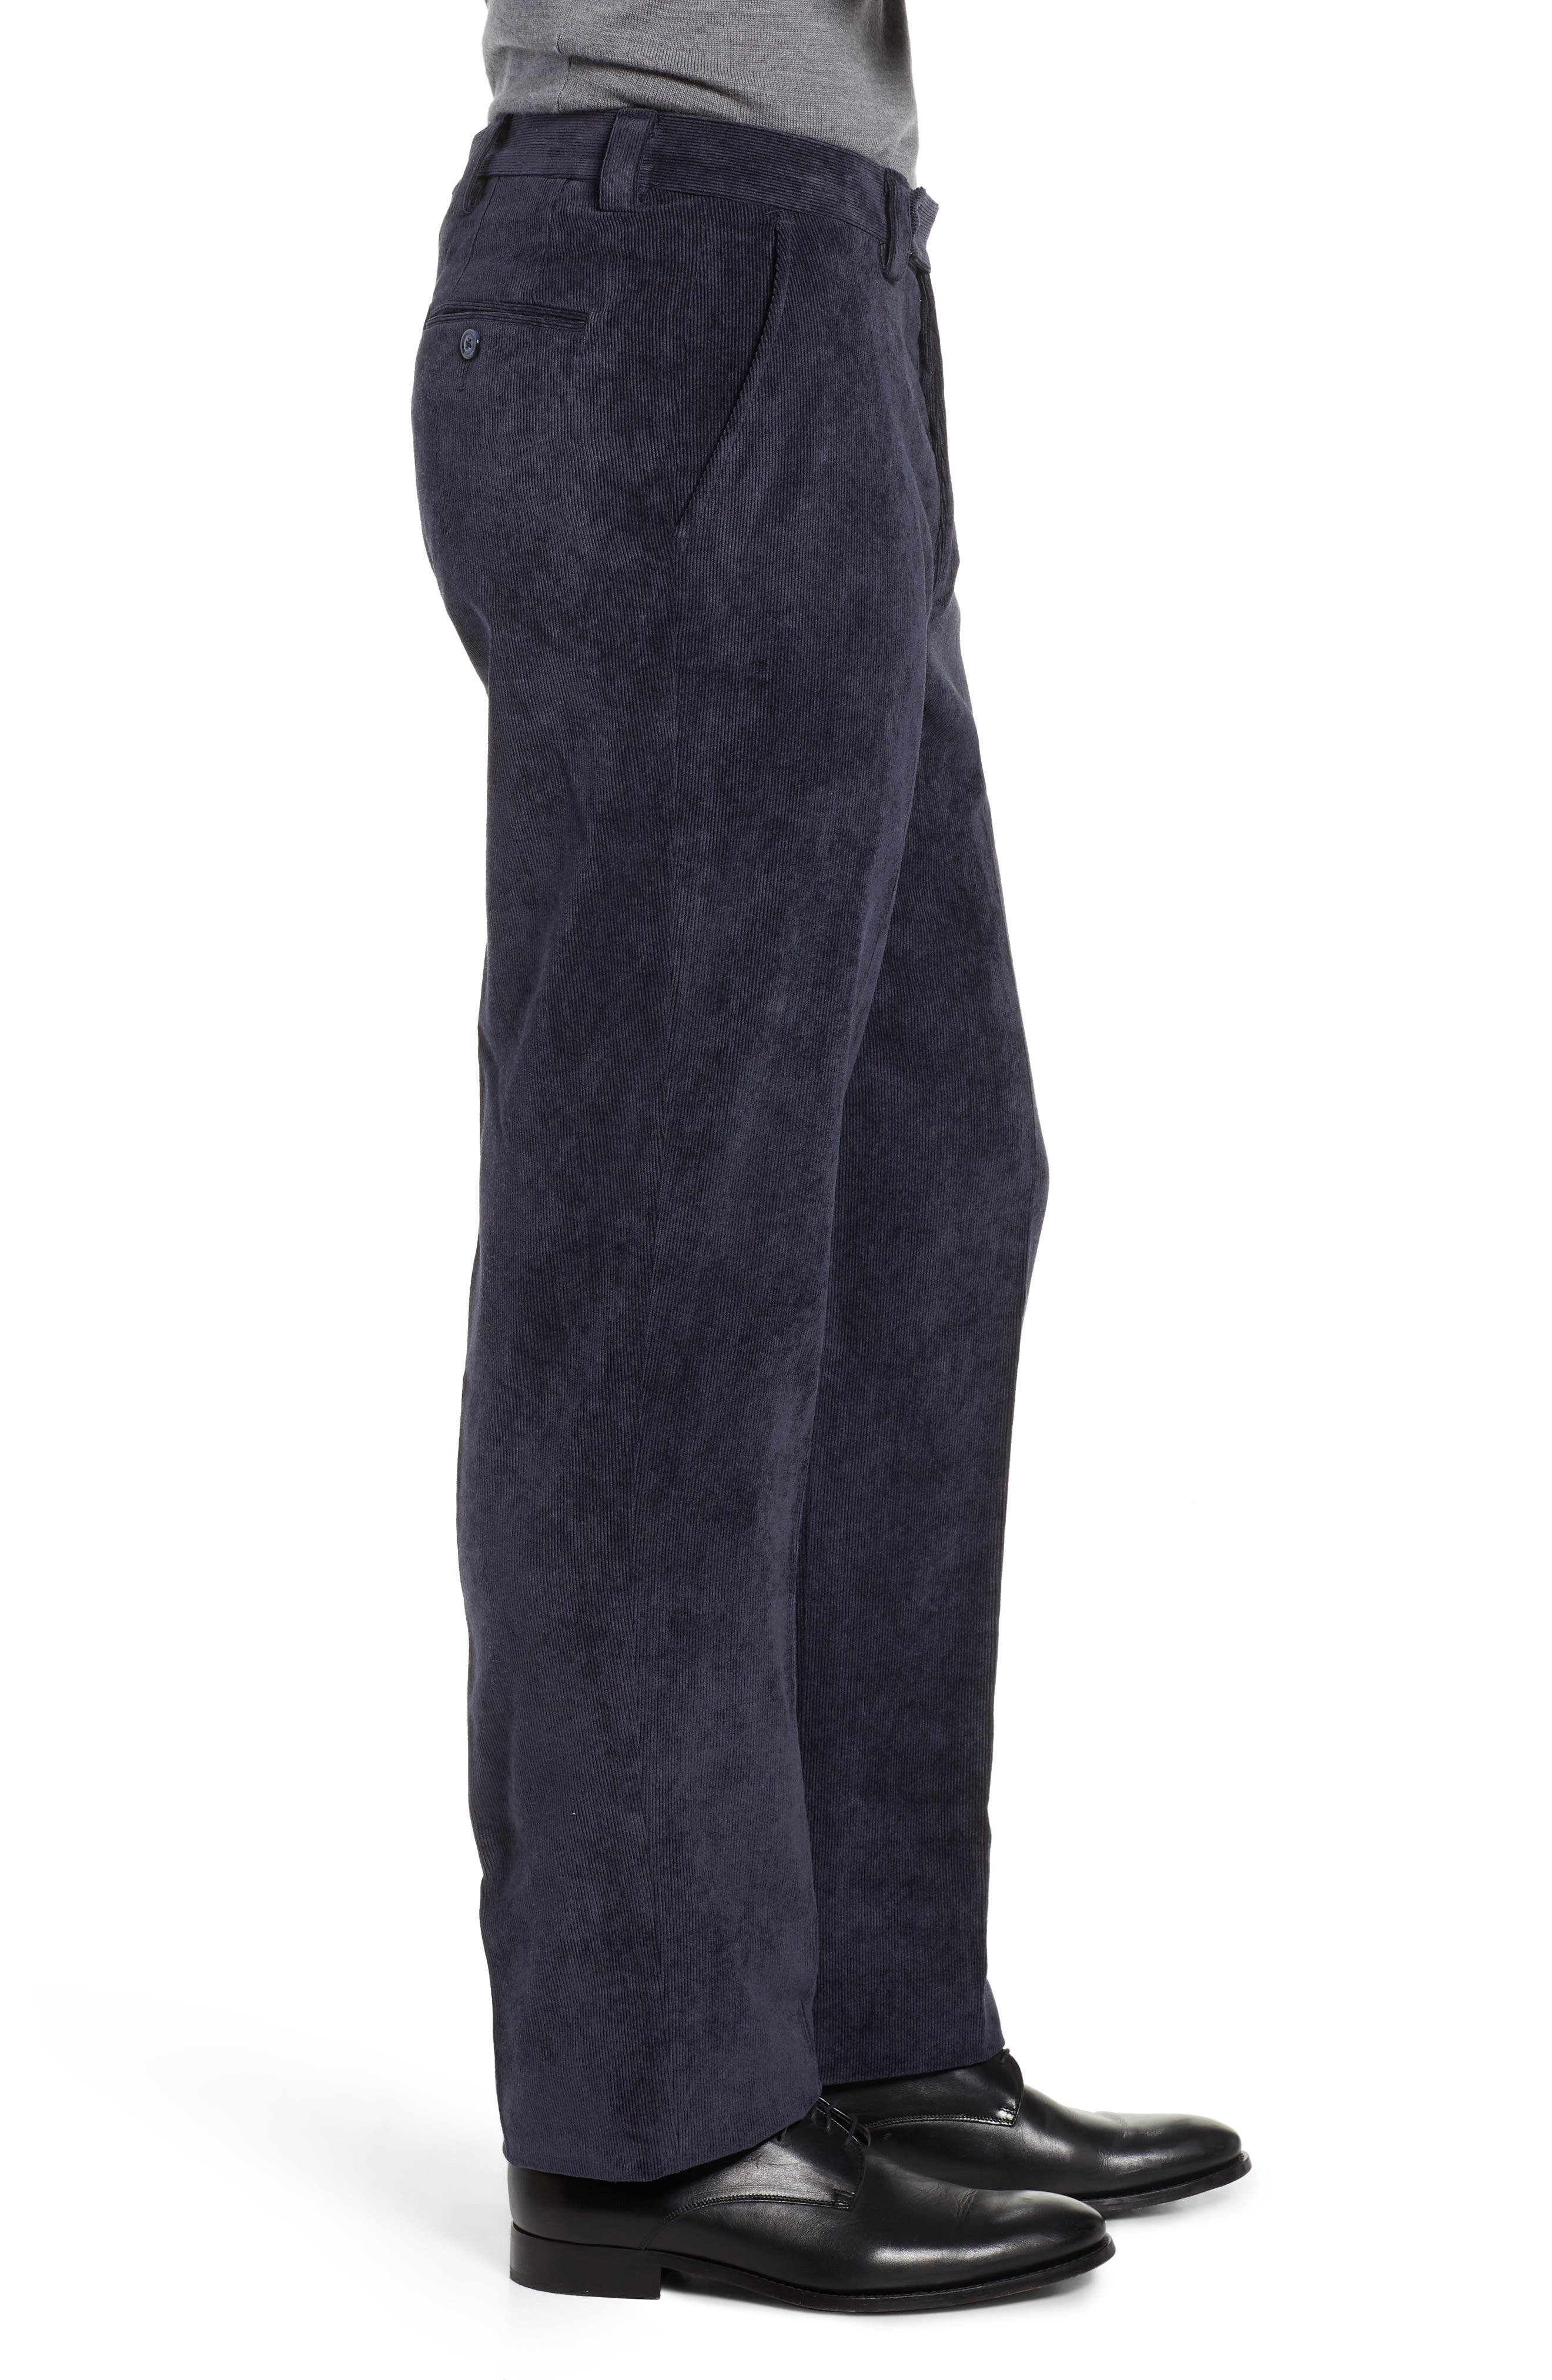 BERLE,                             Classic Fit Flat Front Corduroy Trousers,                             Alternate thumbnail 3, color,                             410